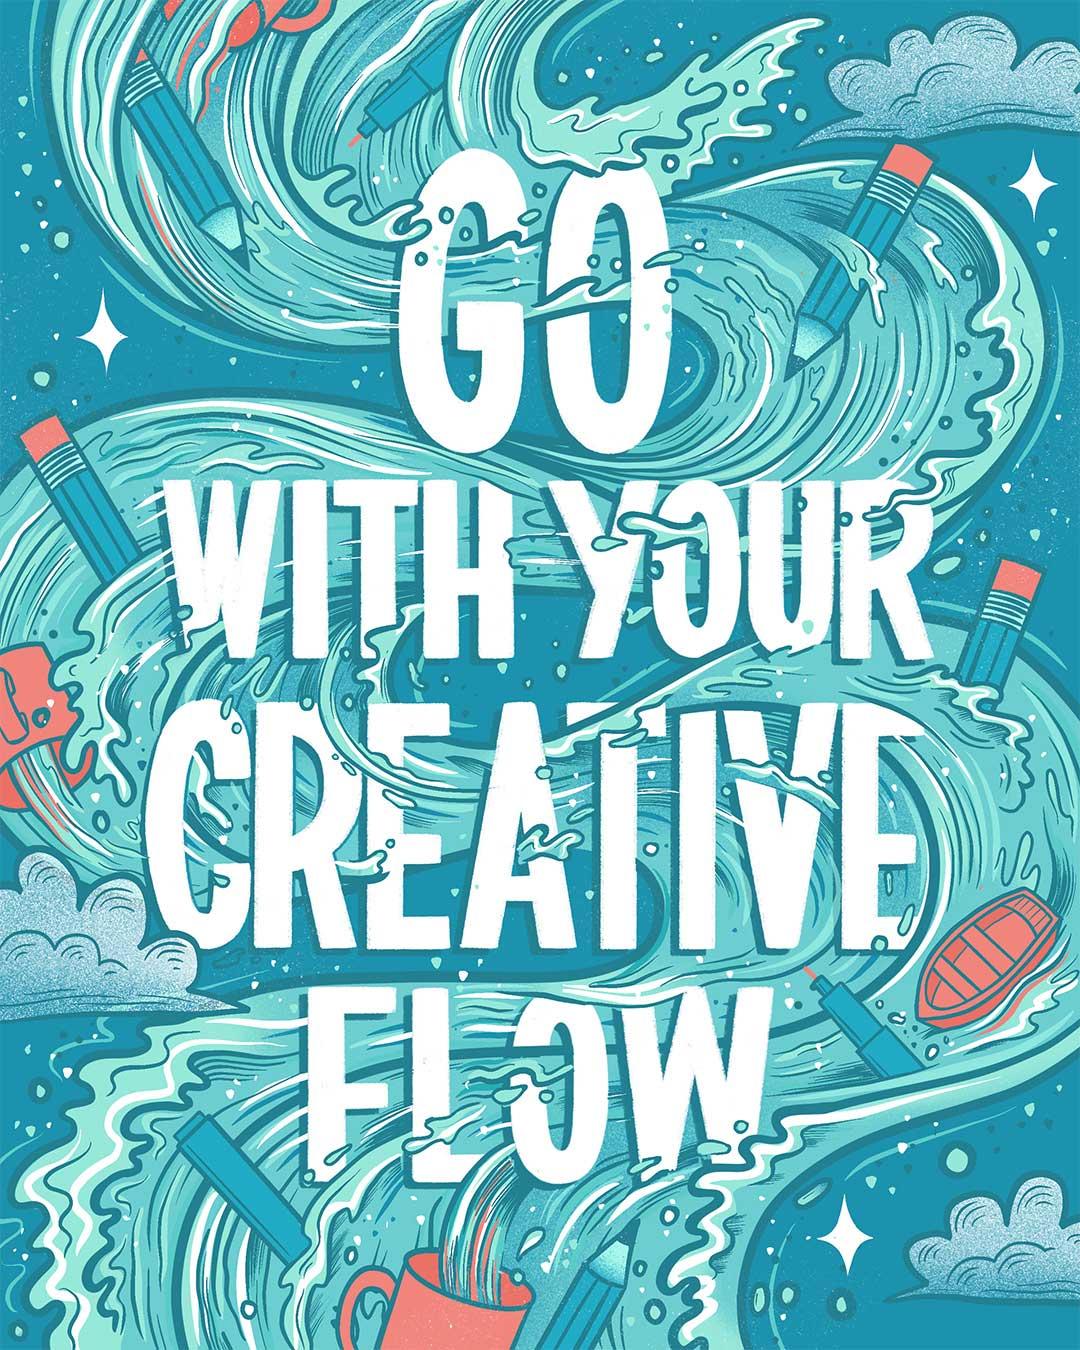 belinda-kou-creative-flow-lettering